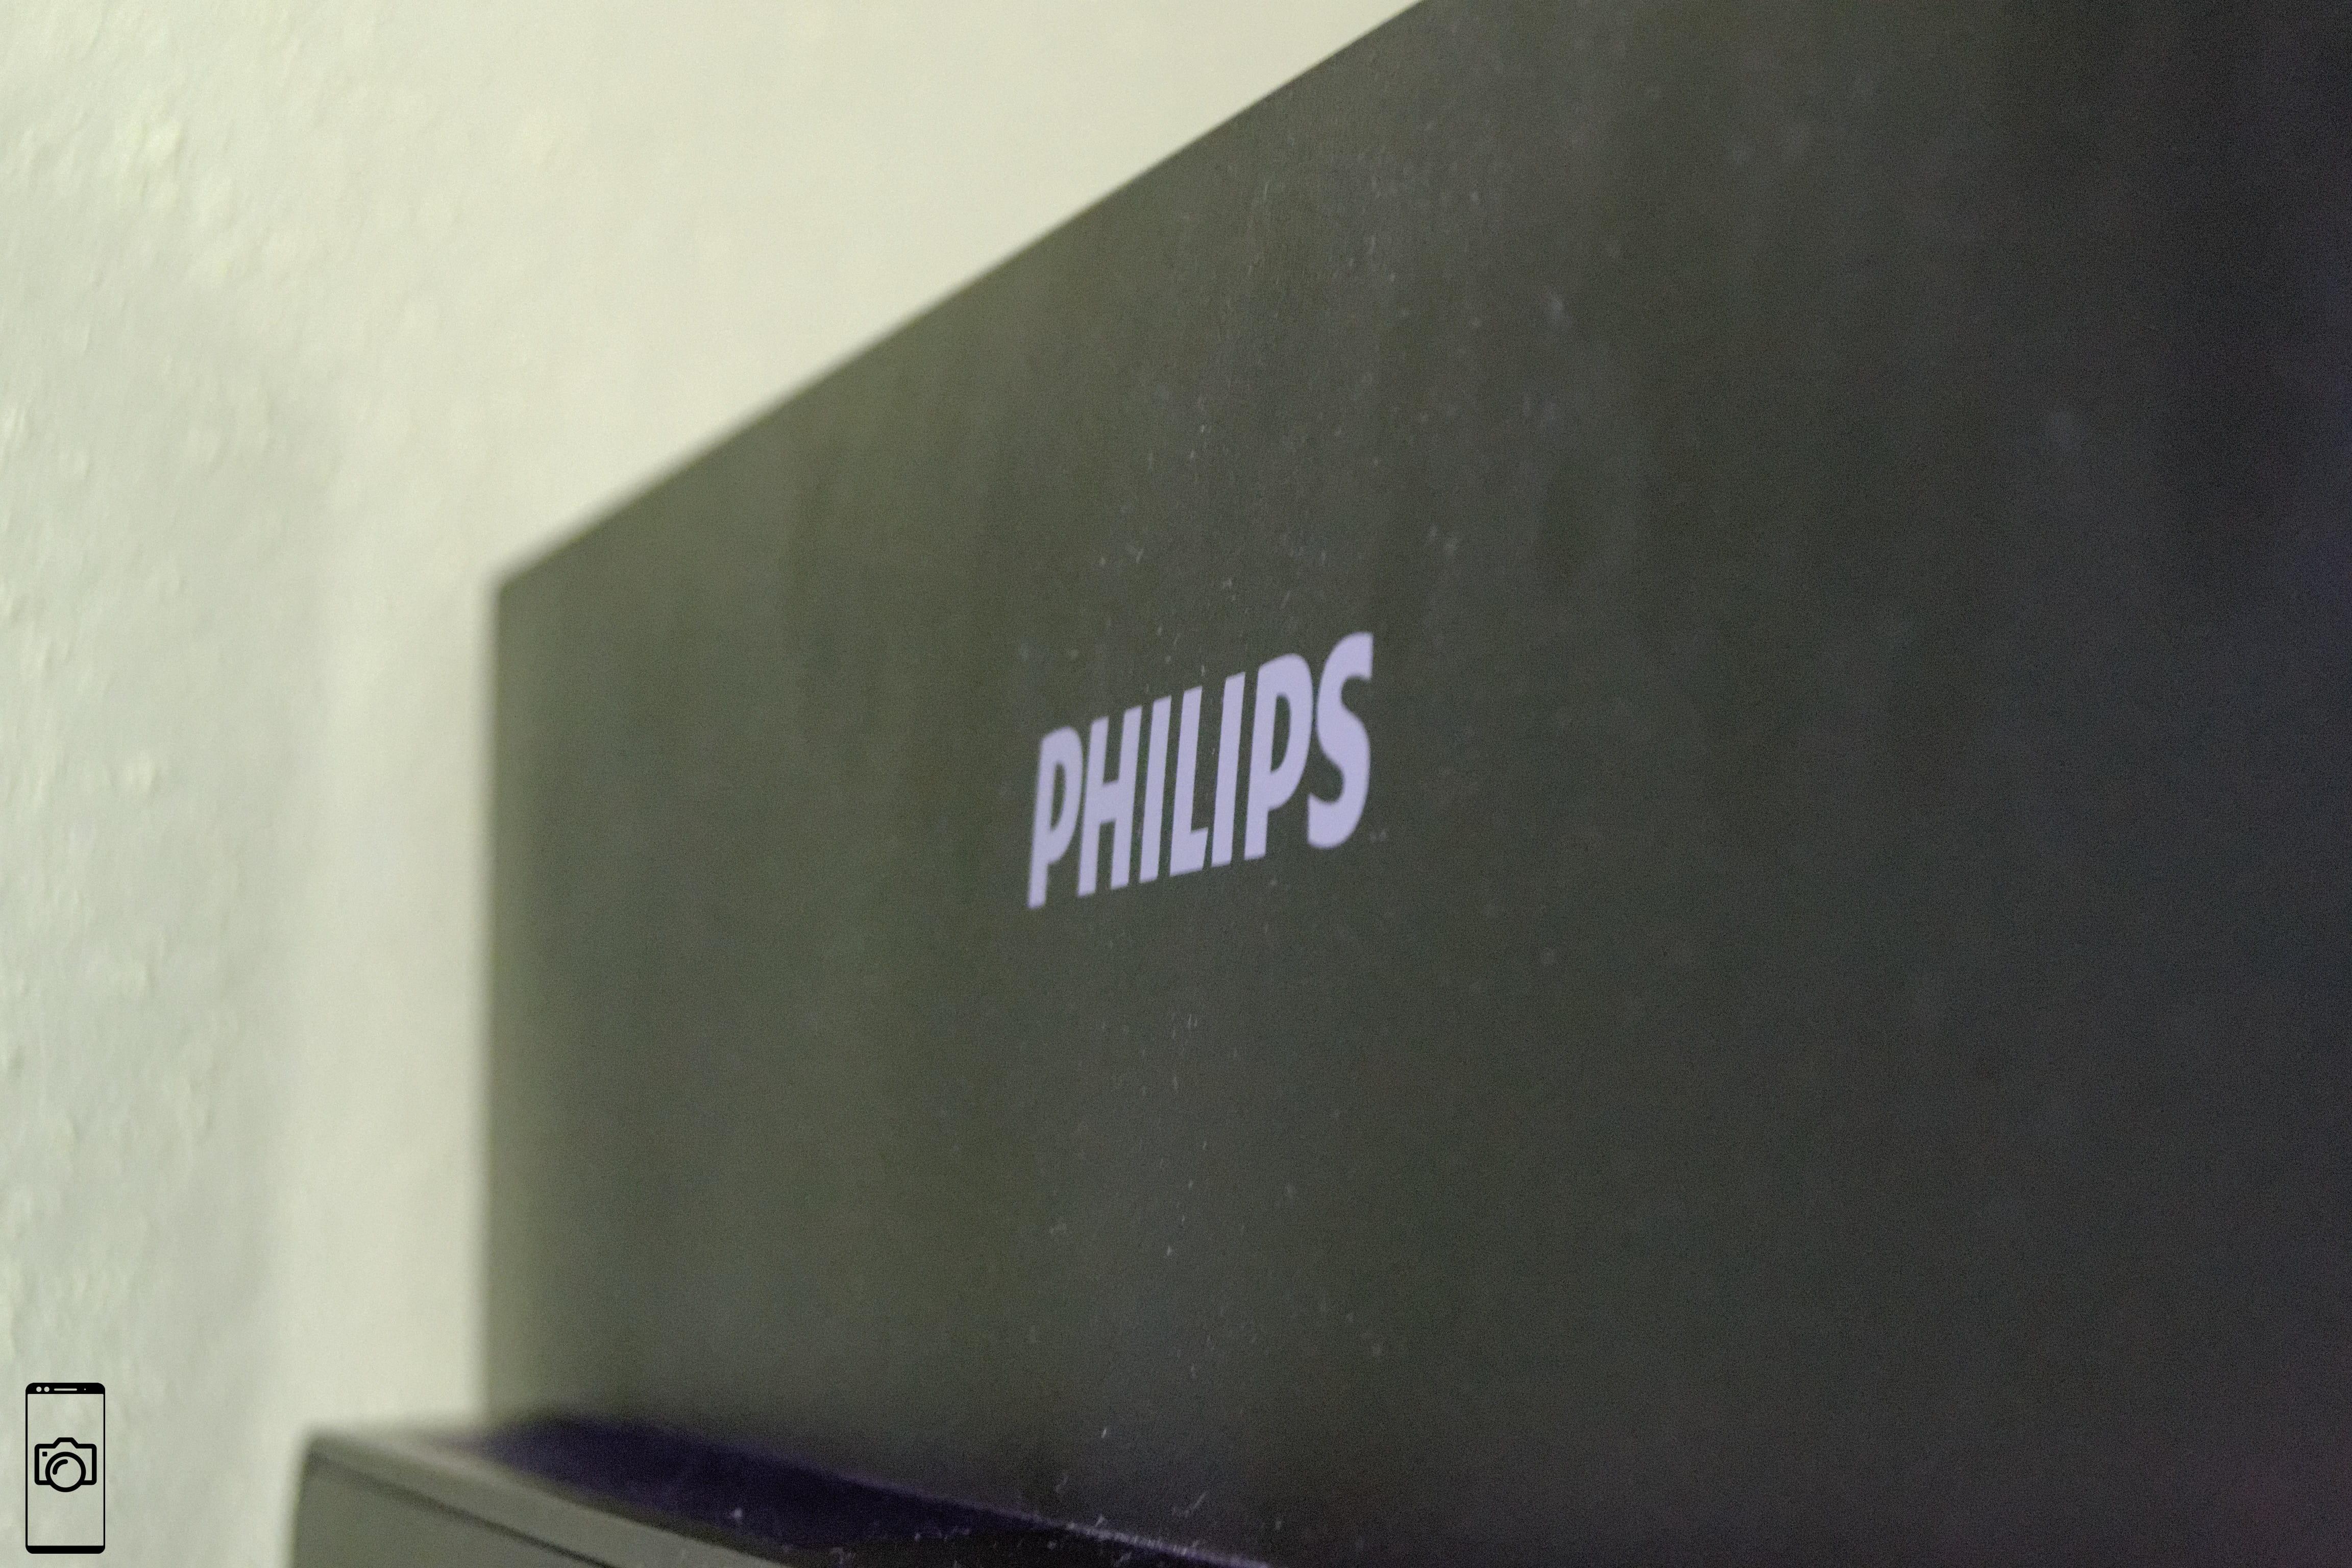 Philips 328P